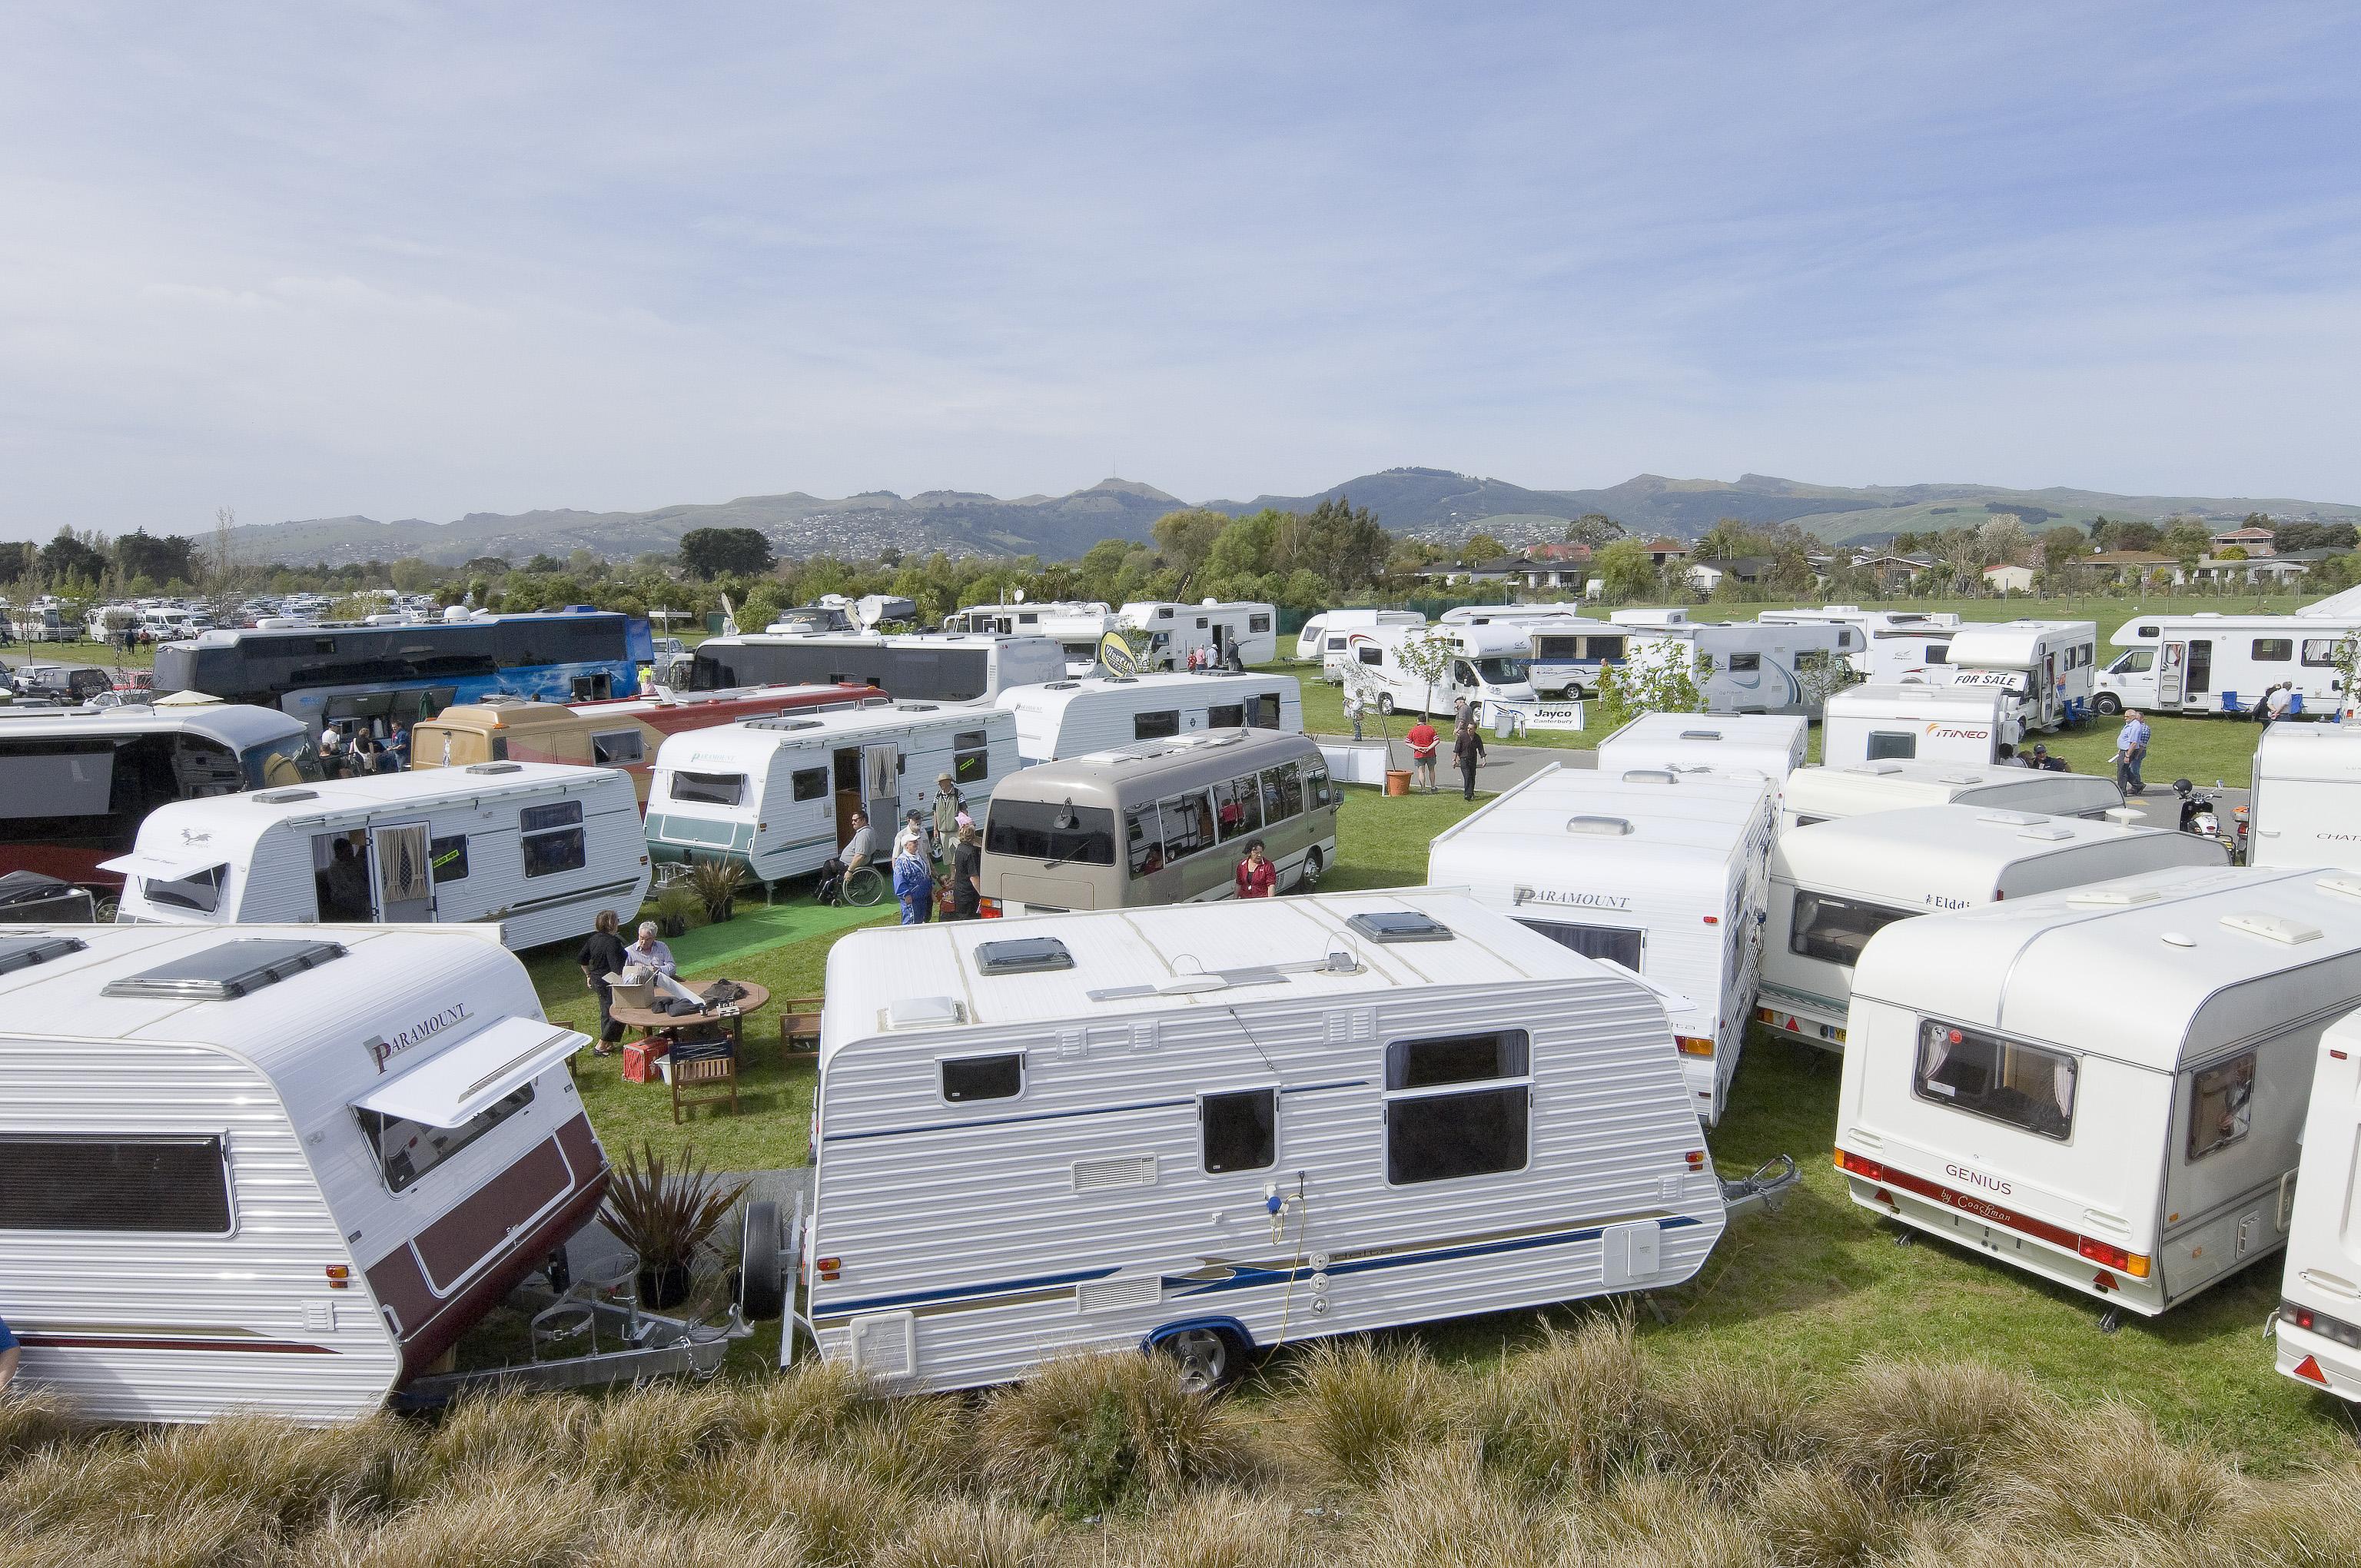 Camper Care Nz Motorhome Caravan Show Your Dreams And Adventures Start Here